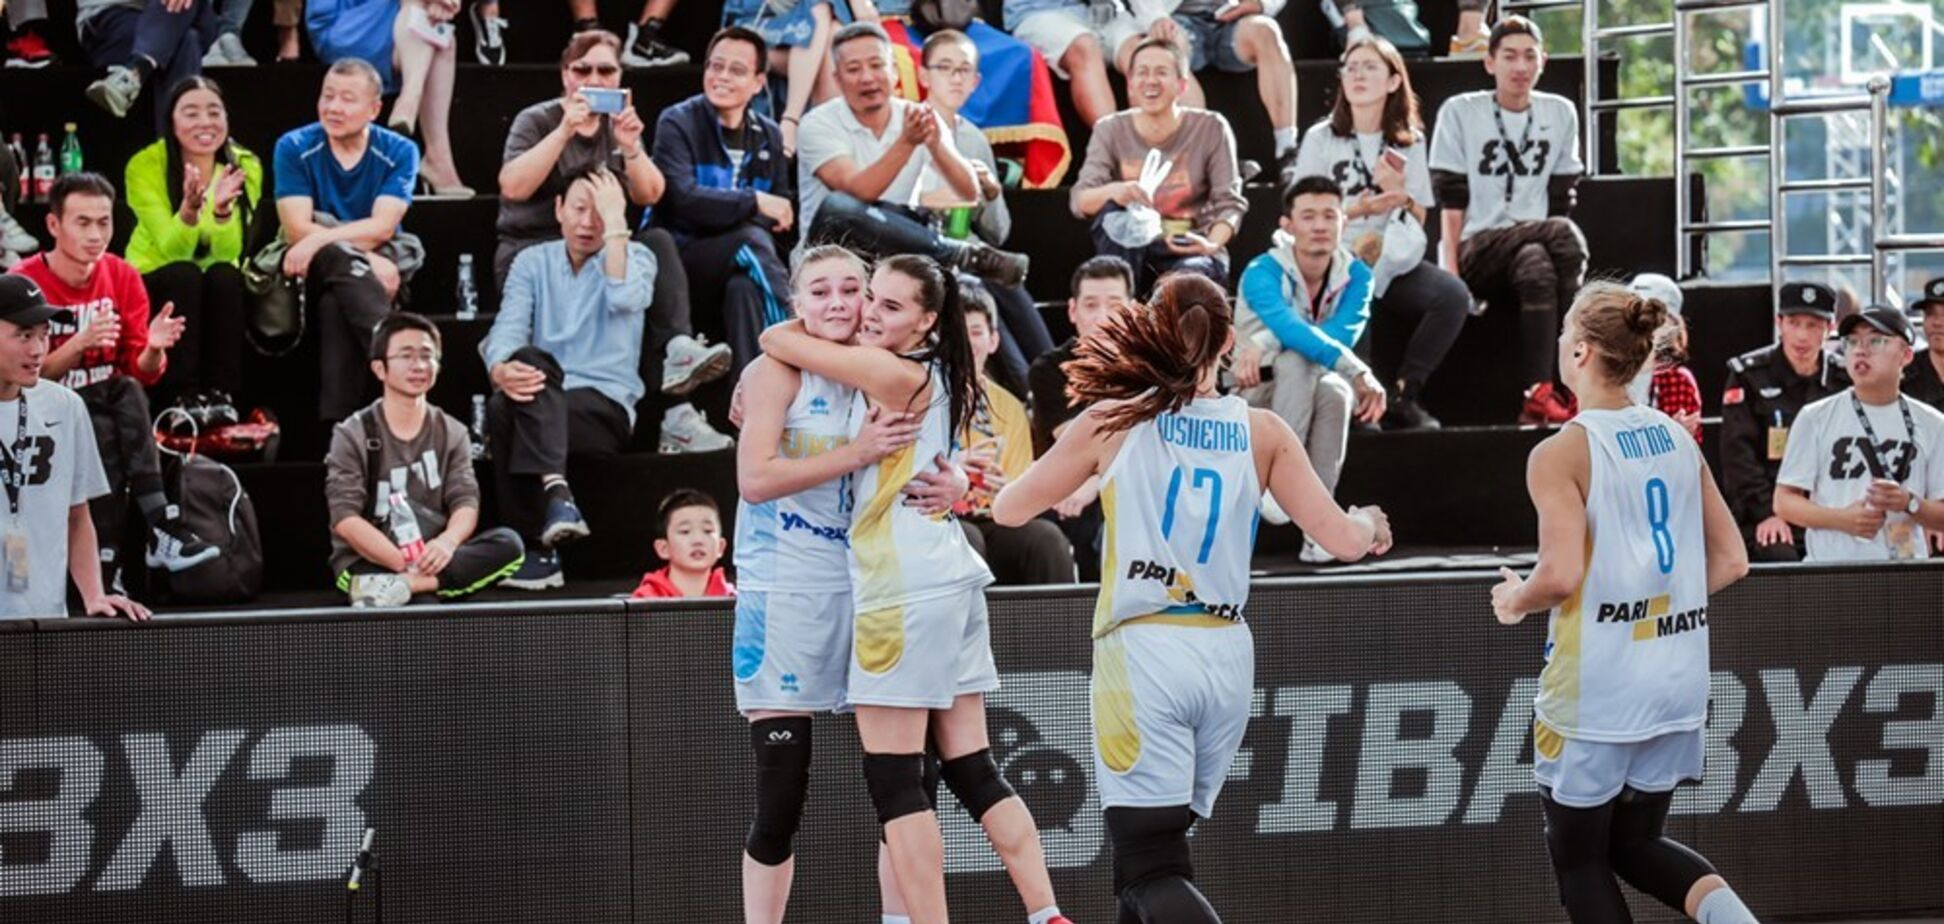 Как украинки победно стартовали на КМ U-23 по баскетболу 3х3: видео